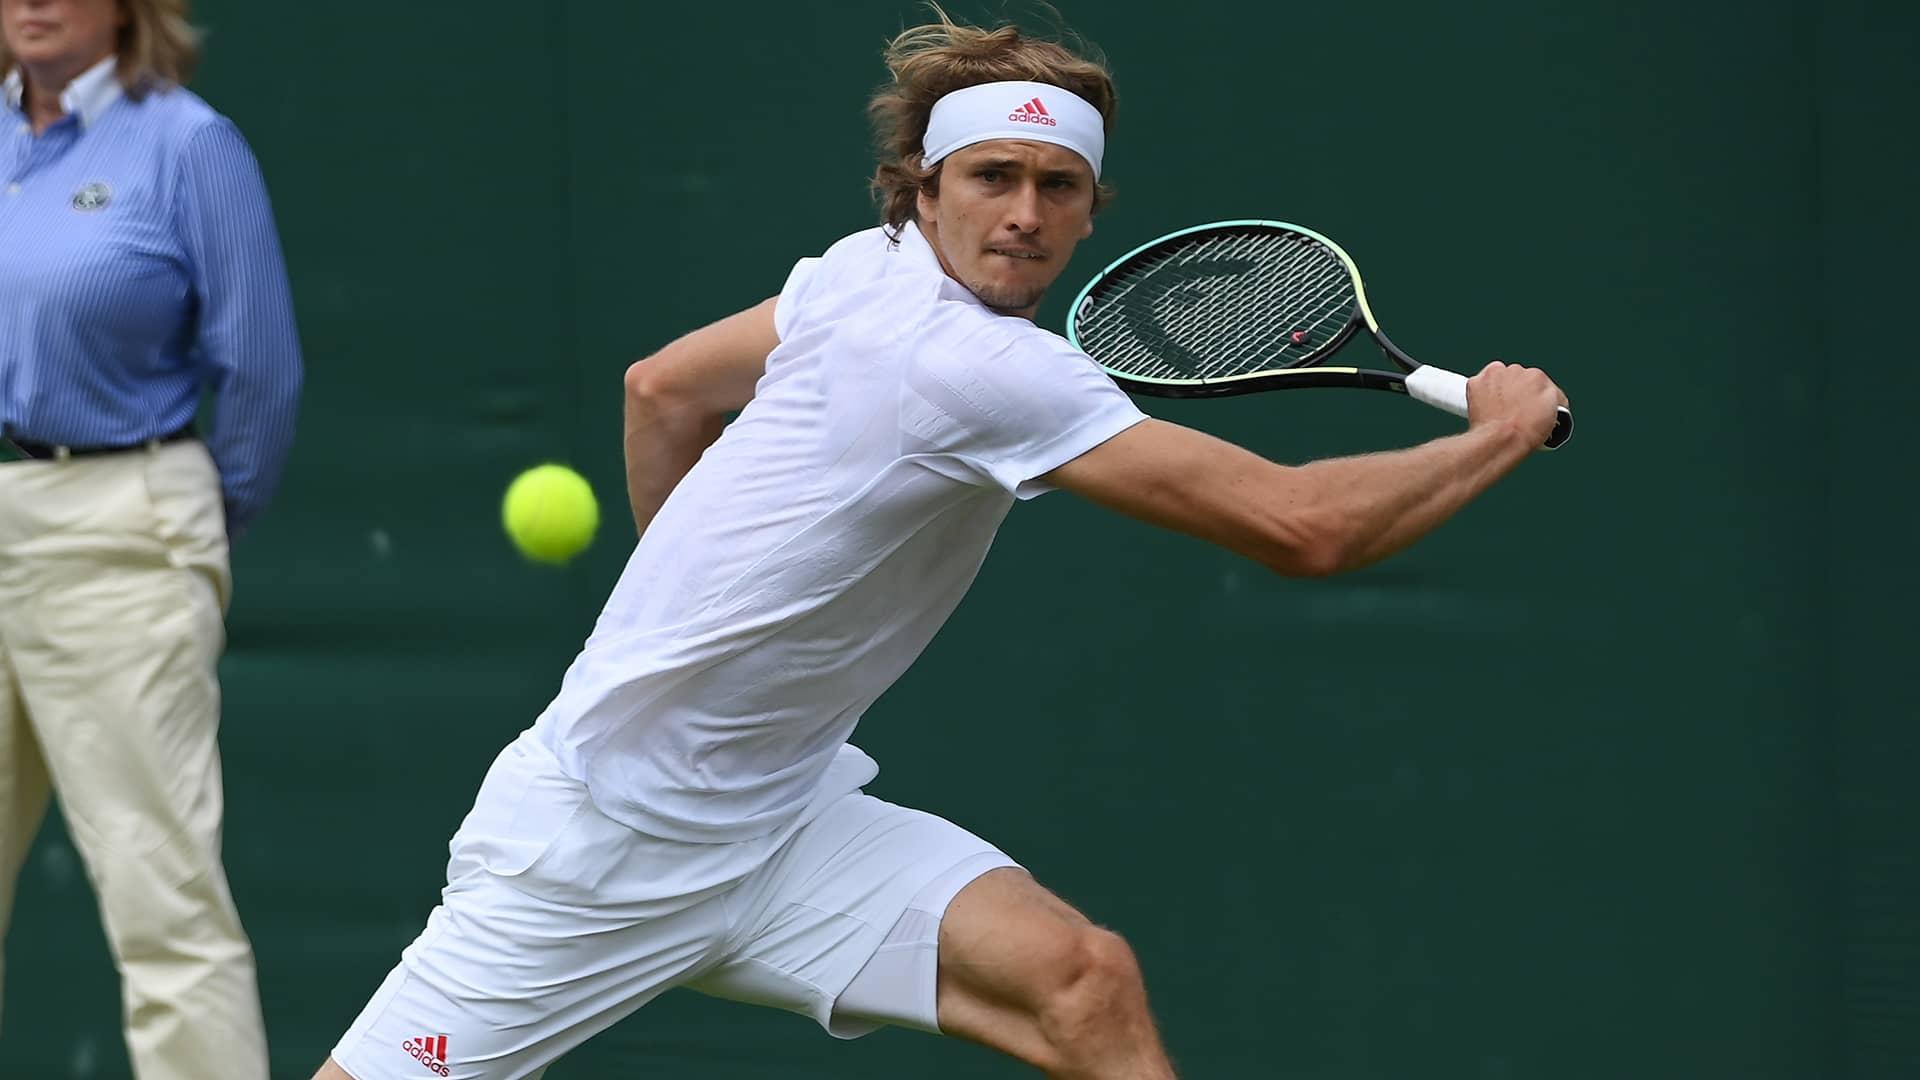 Wimbledon Championships 2021: Alexander Zverev vs. Taylor Fritz Tennis Pick and Prediction